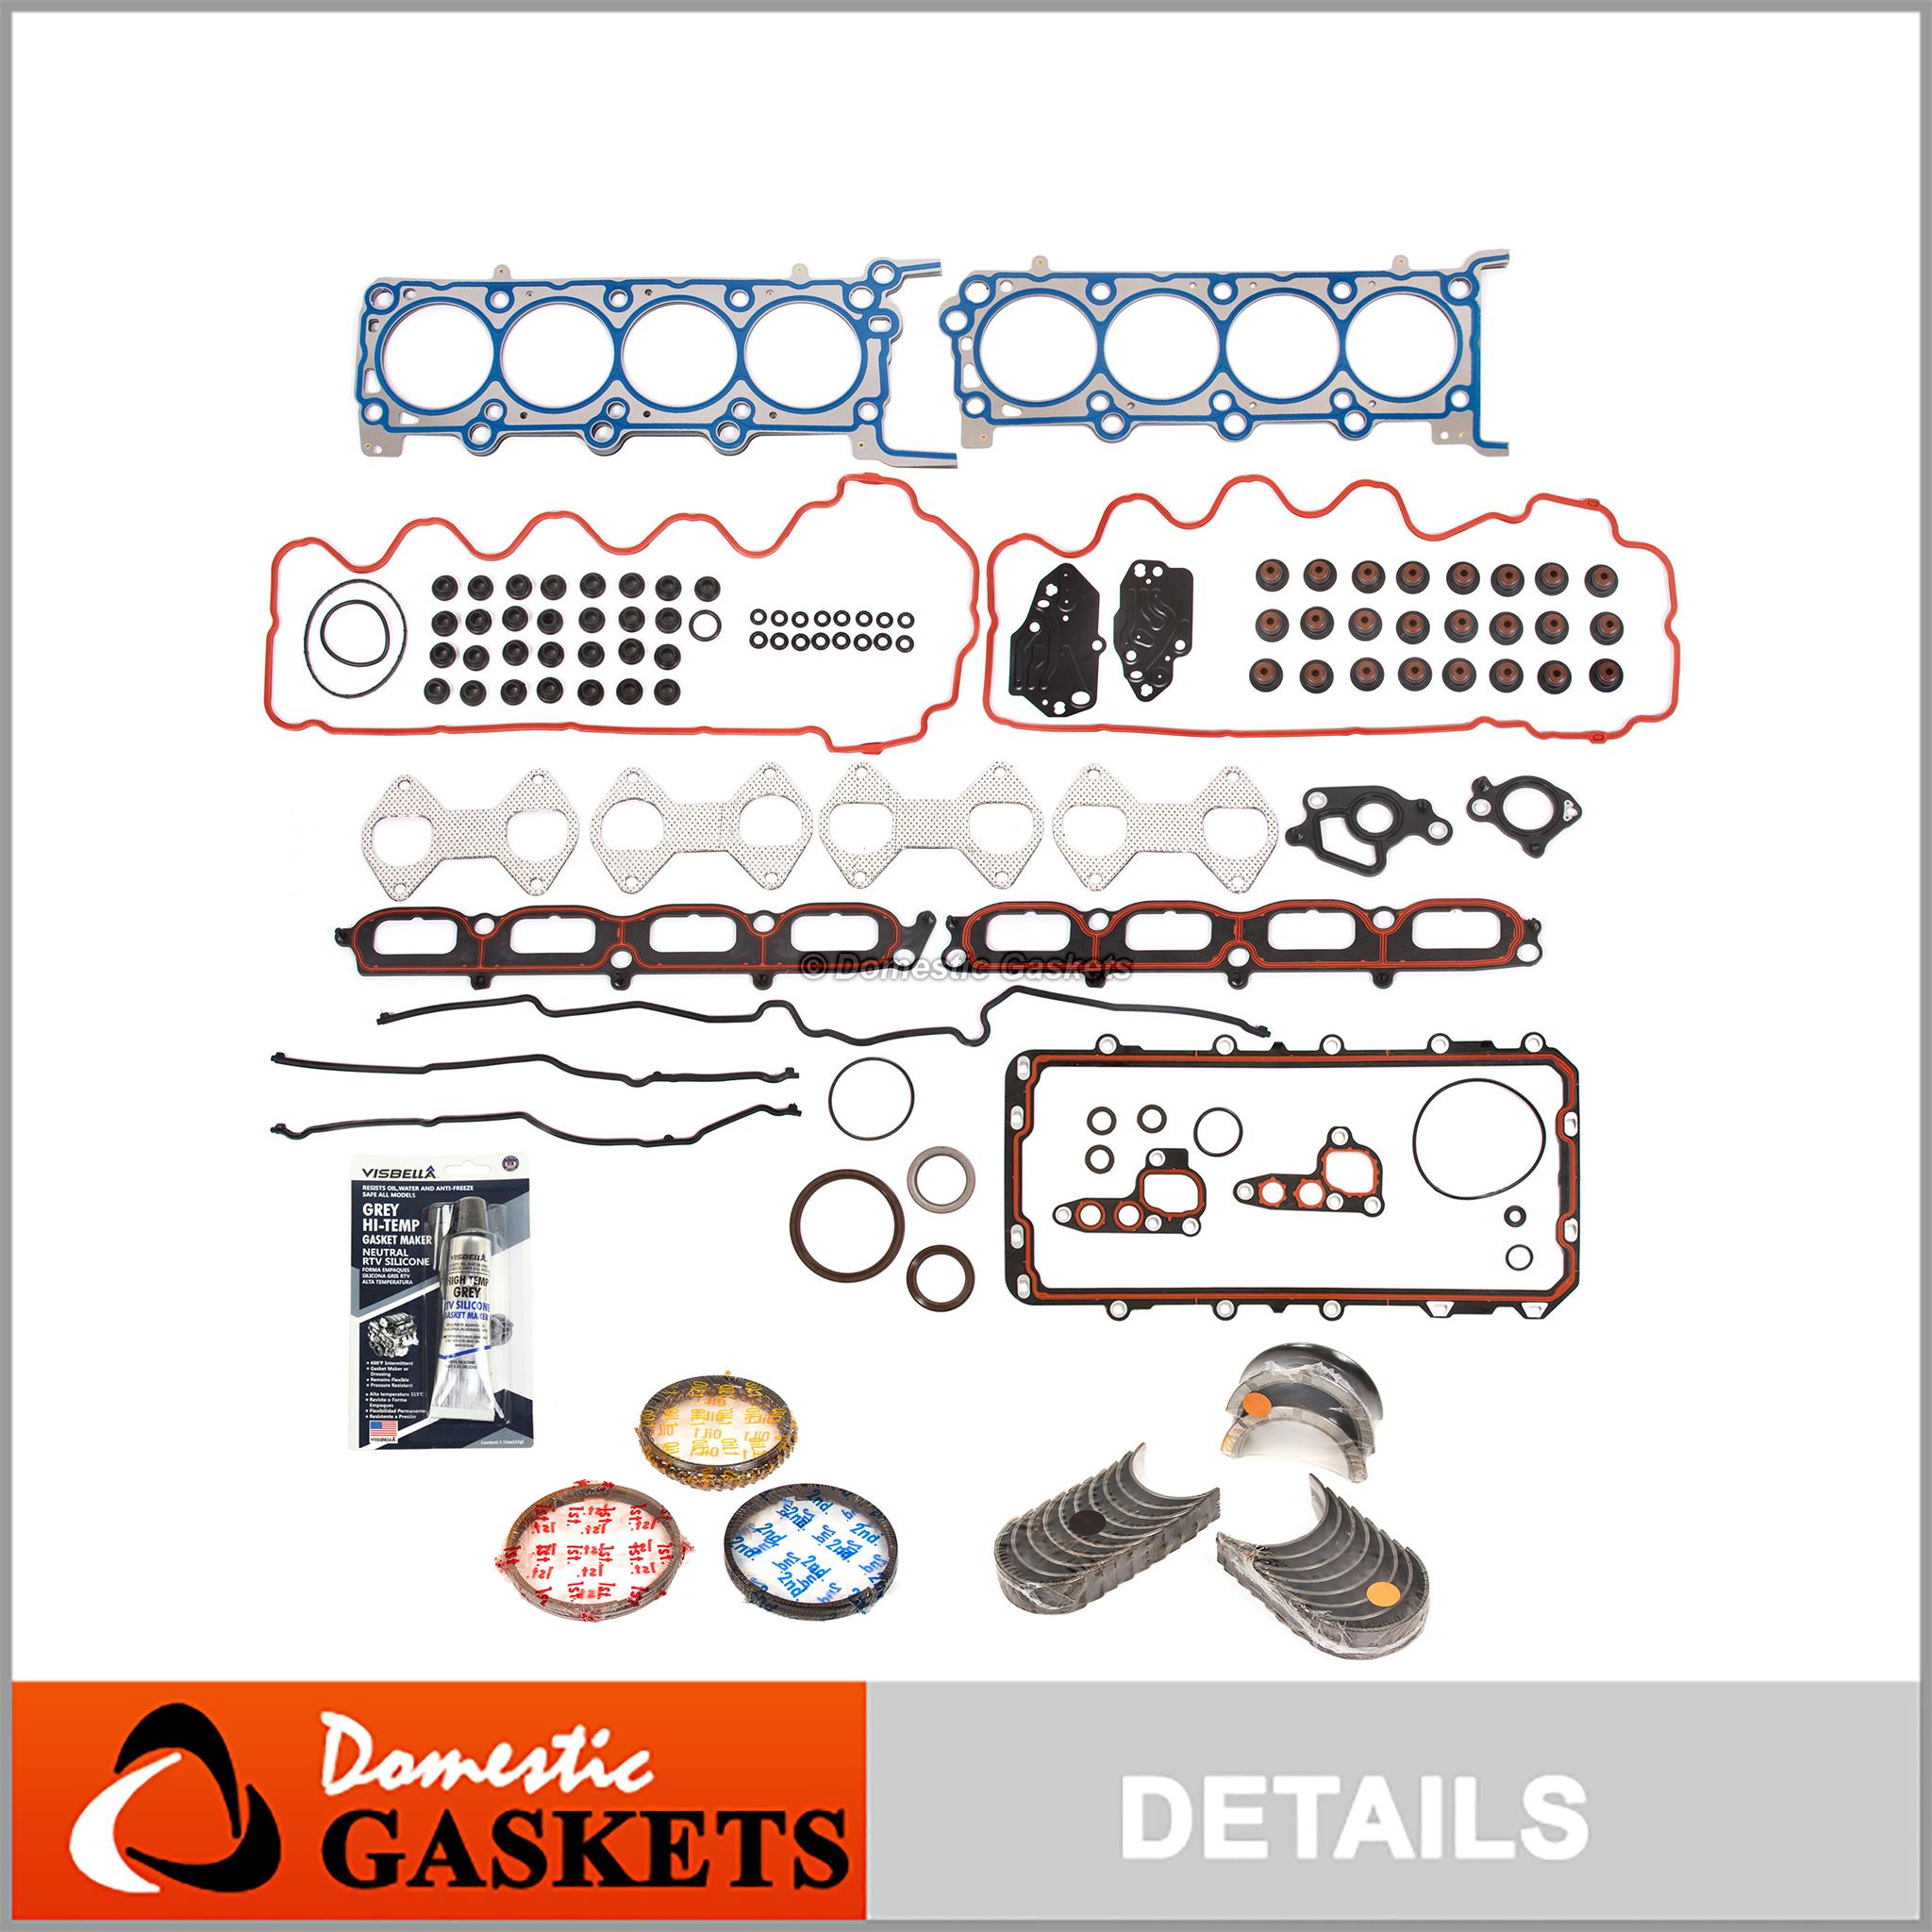 Full Gasket Set Bearings Rings Fit 07-12 Ford F150 F250 5.4 TRITON 3-Valve